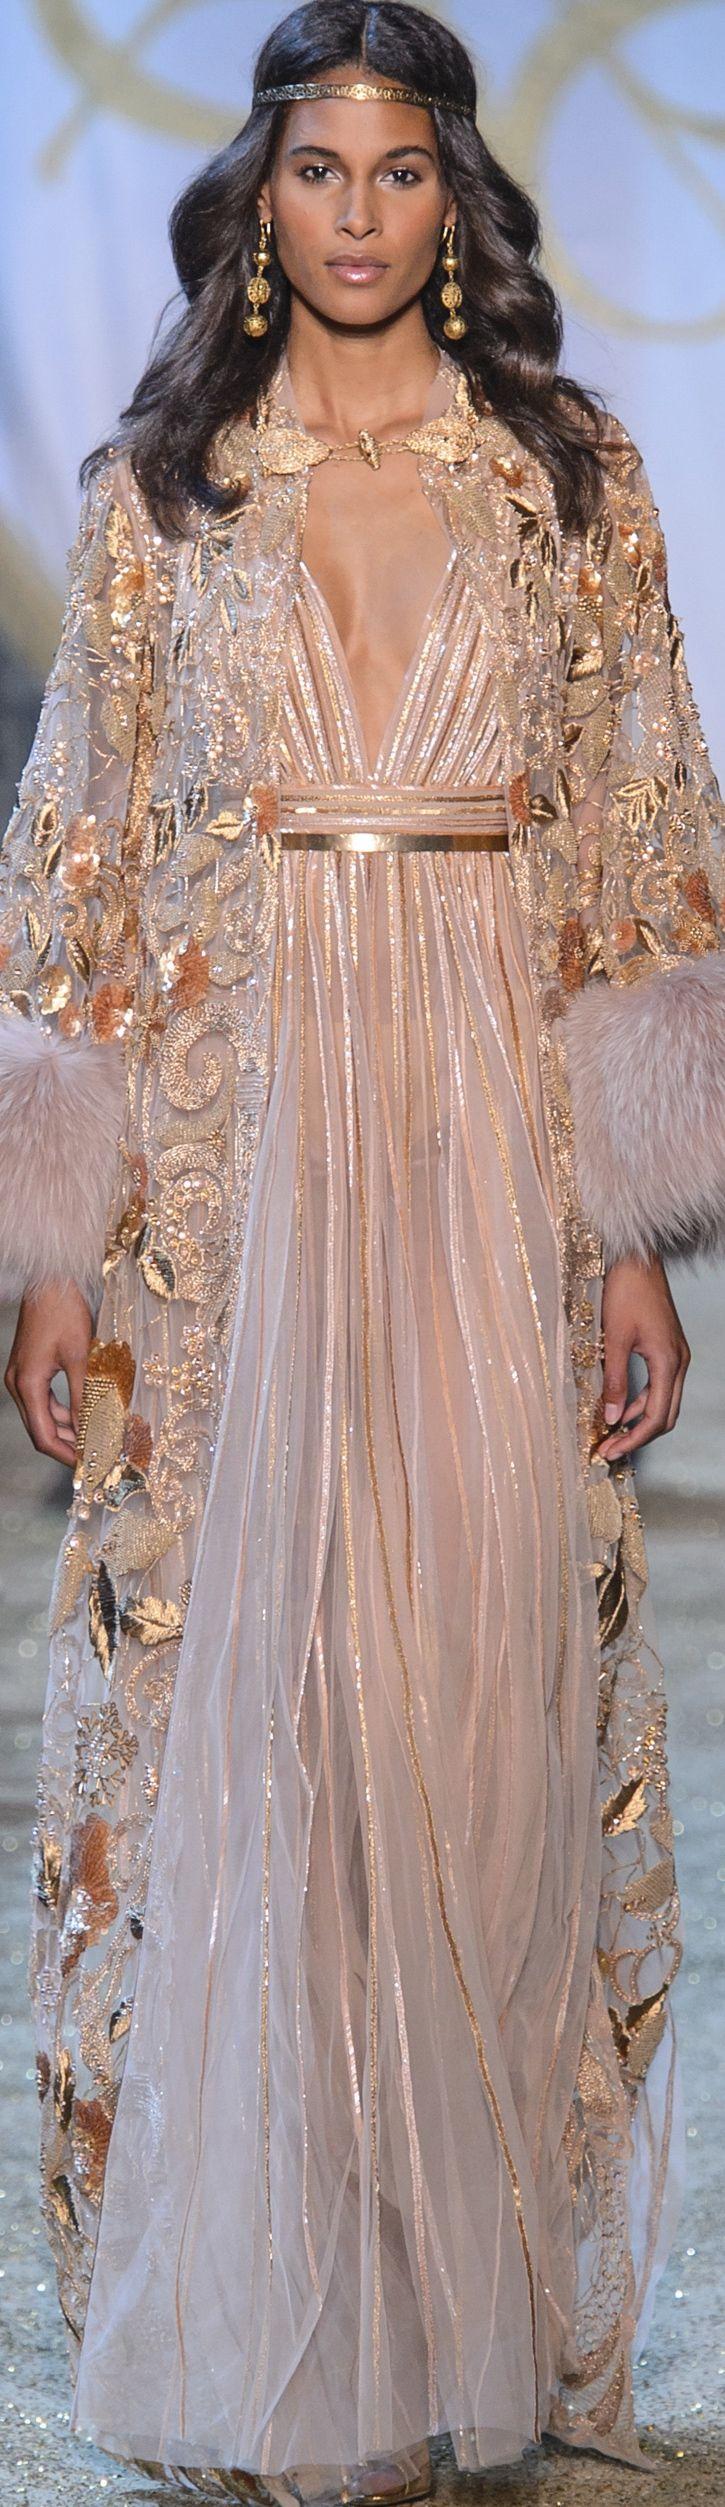 Elie Saab Fall 2017 Haute Couture